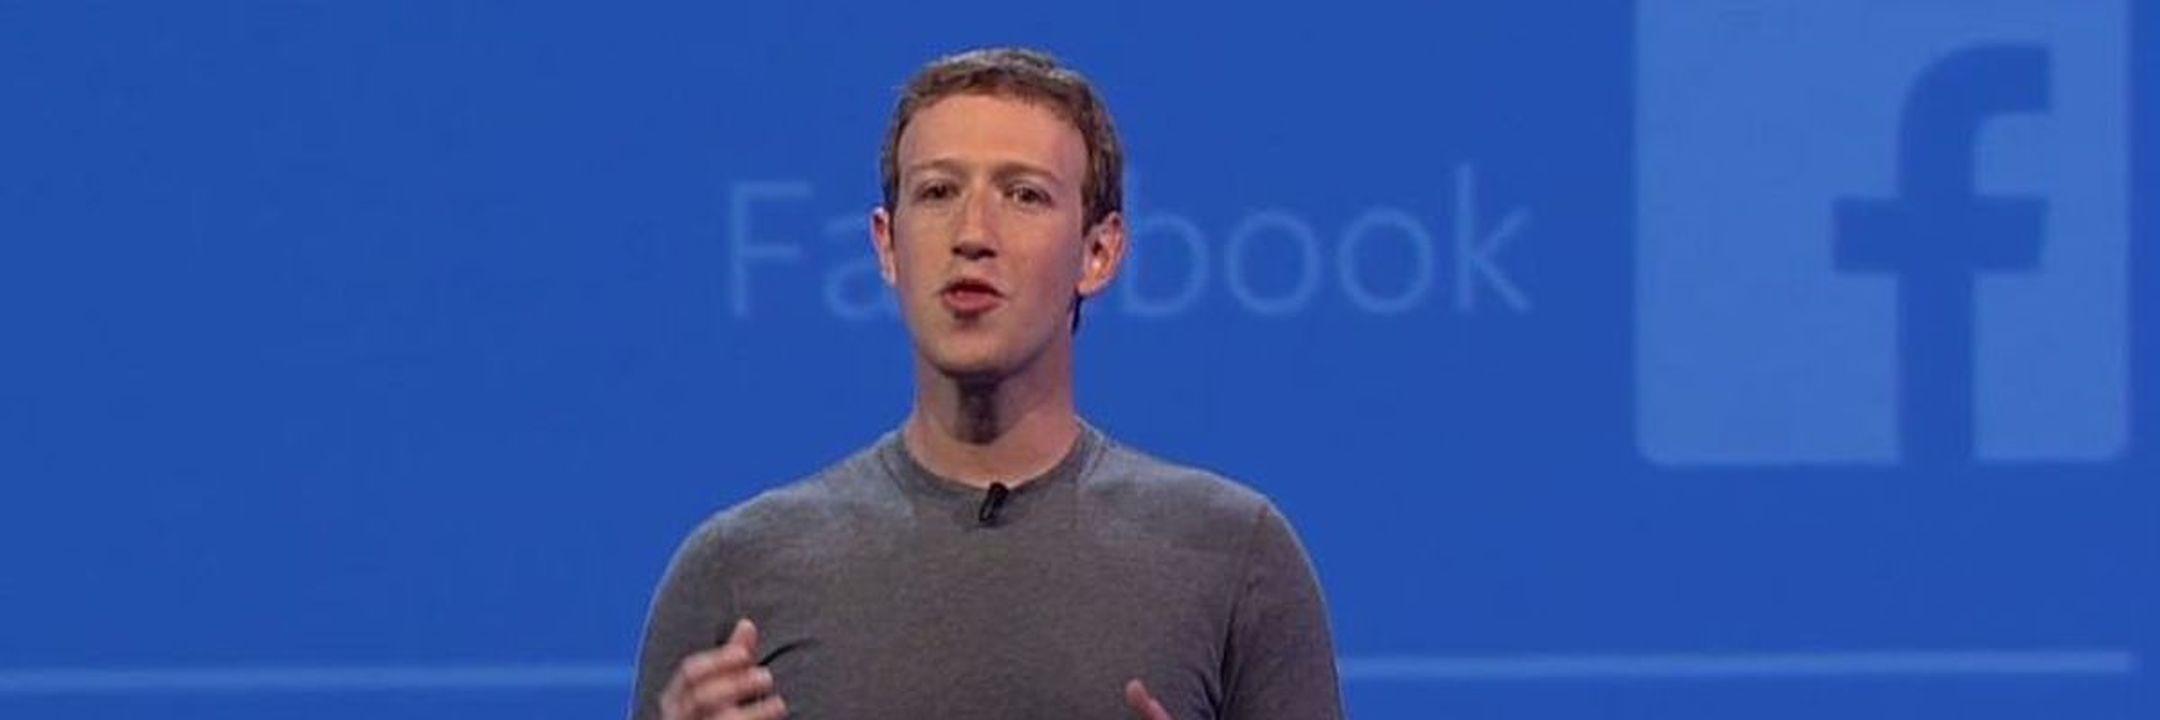 Zuckerberg revela novidades para o Facebook que fazem lembrar o Clubhouse